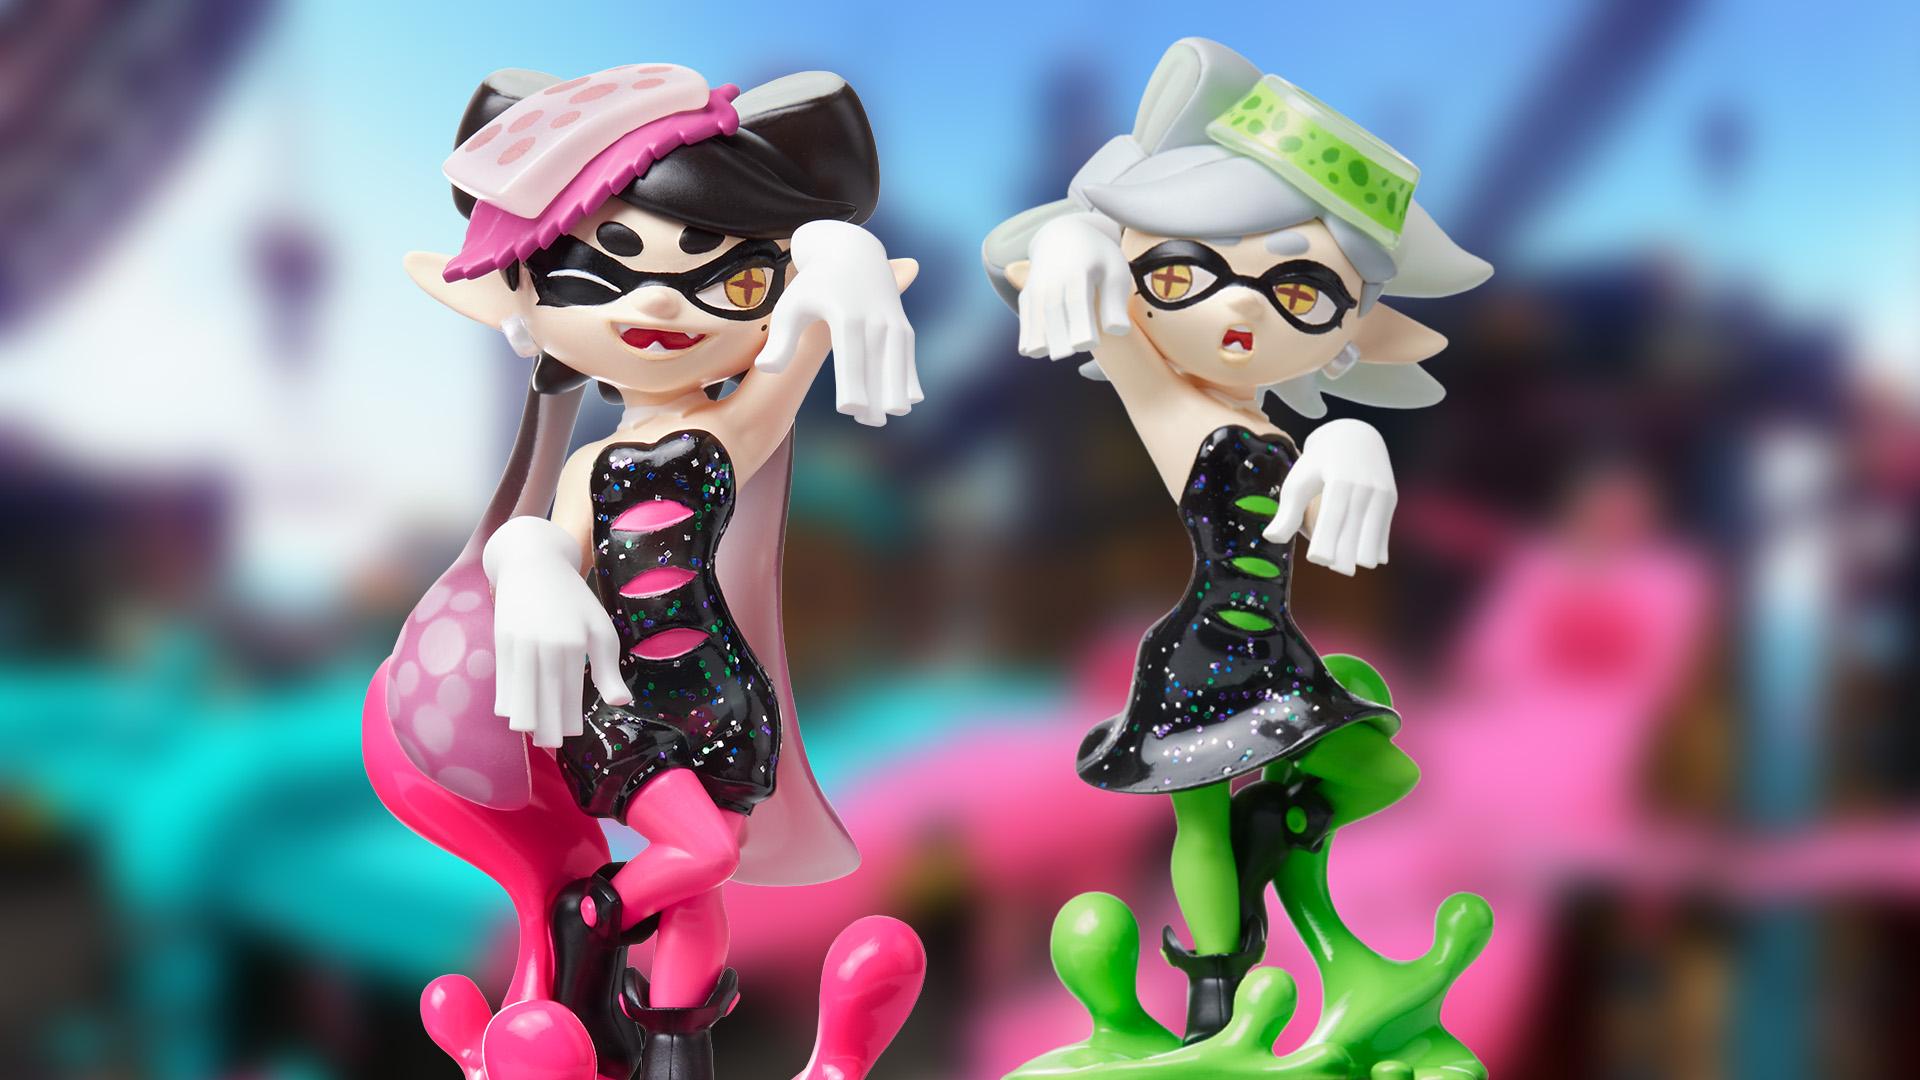 Callie And Marie Wallpaper: Splatoon 2's Squid Sisters Prologue Keeps Getting Juicier